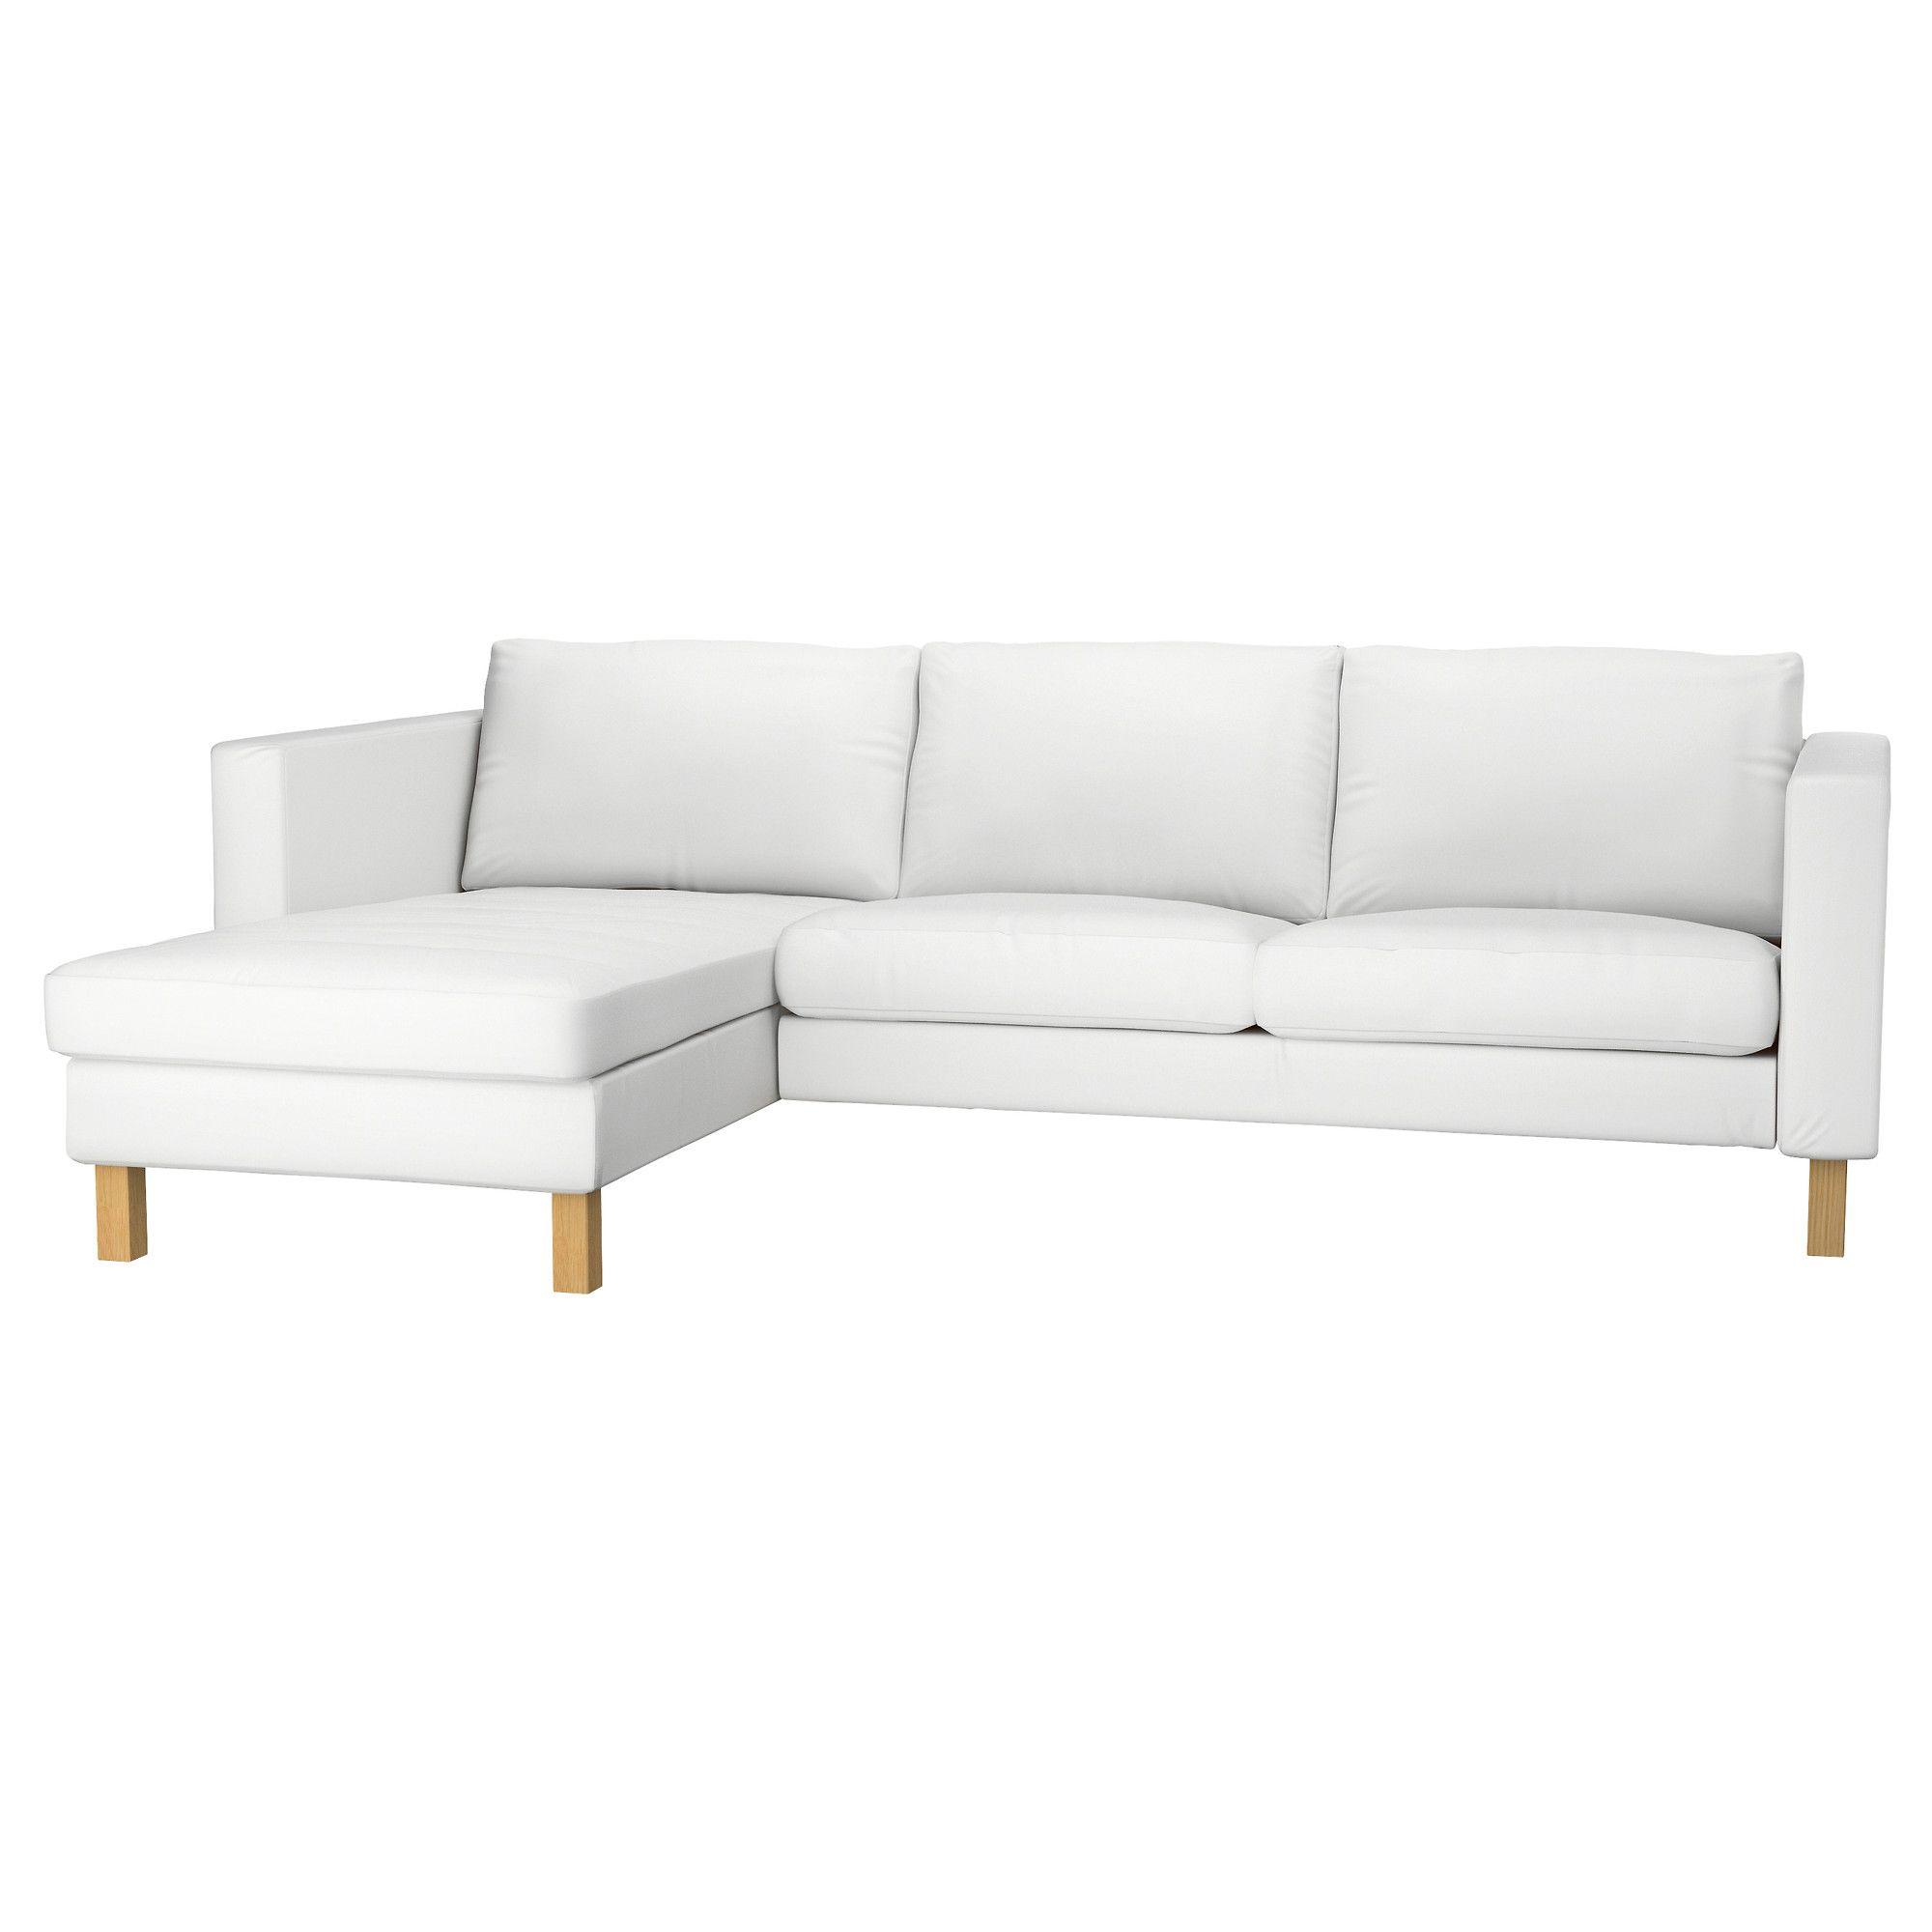 KARLSTAD Canapé 2 places méri nne Blekinge blanc IKEA